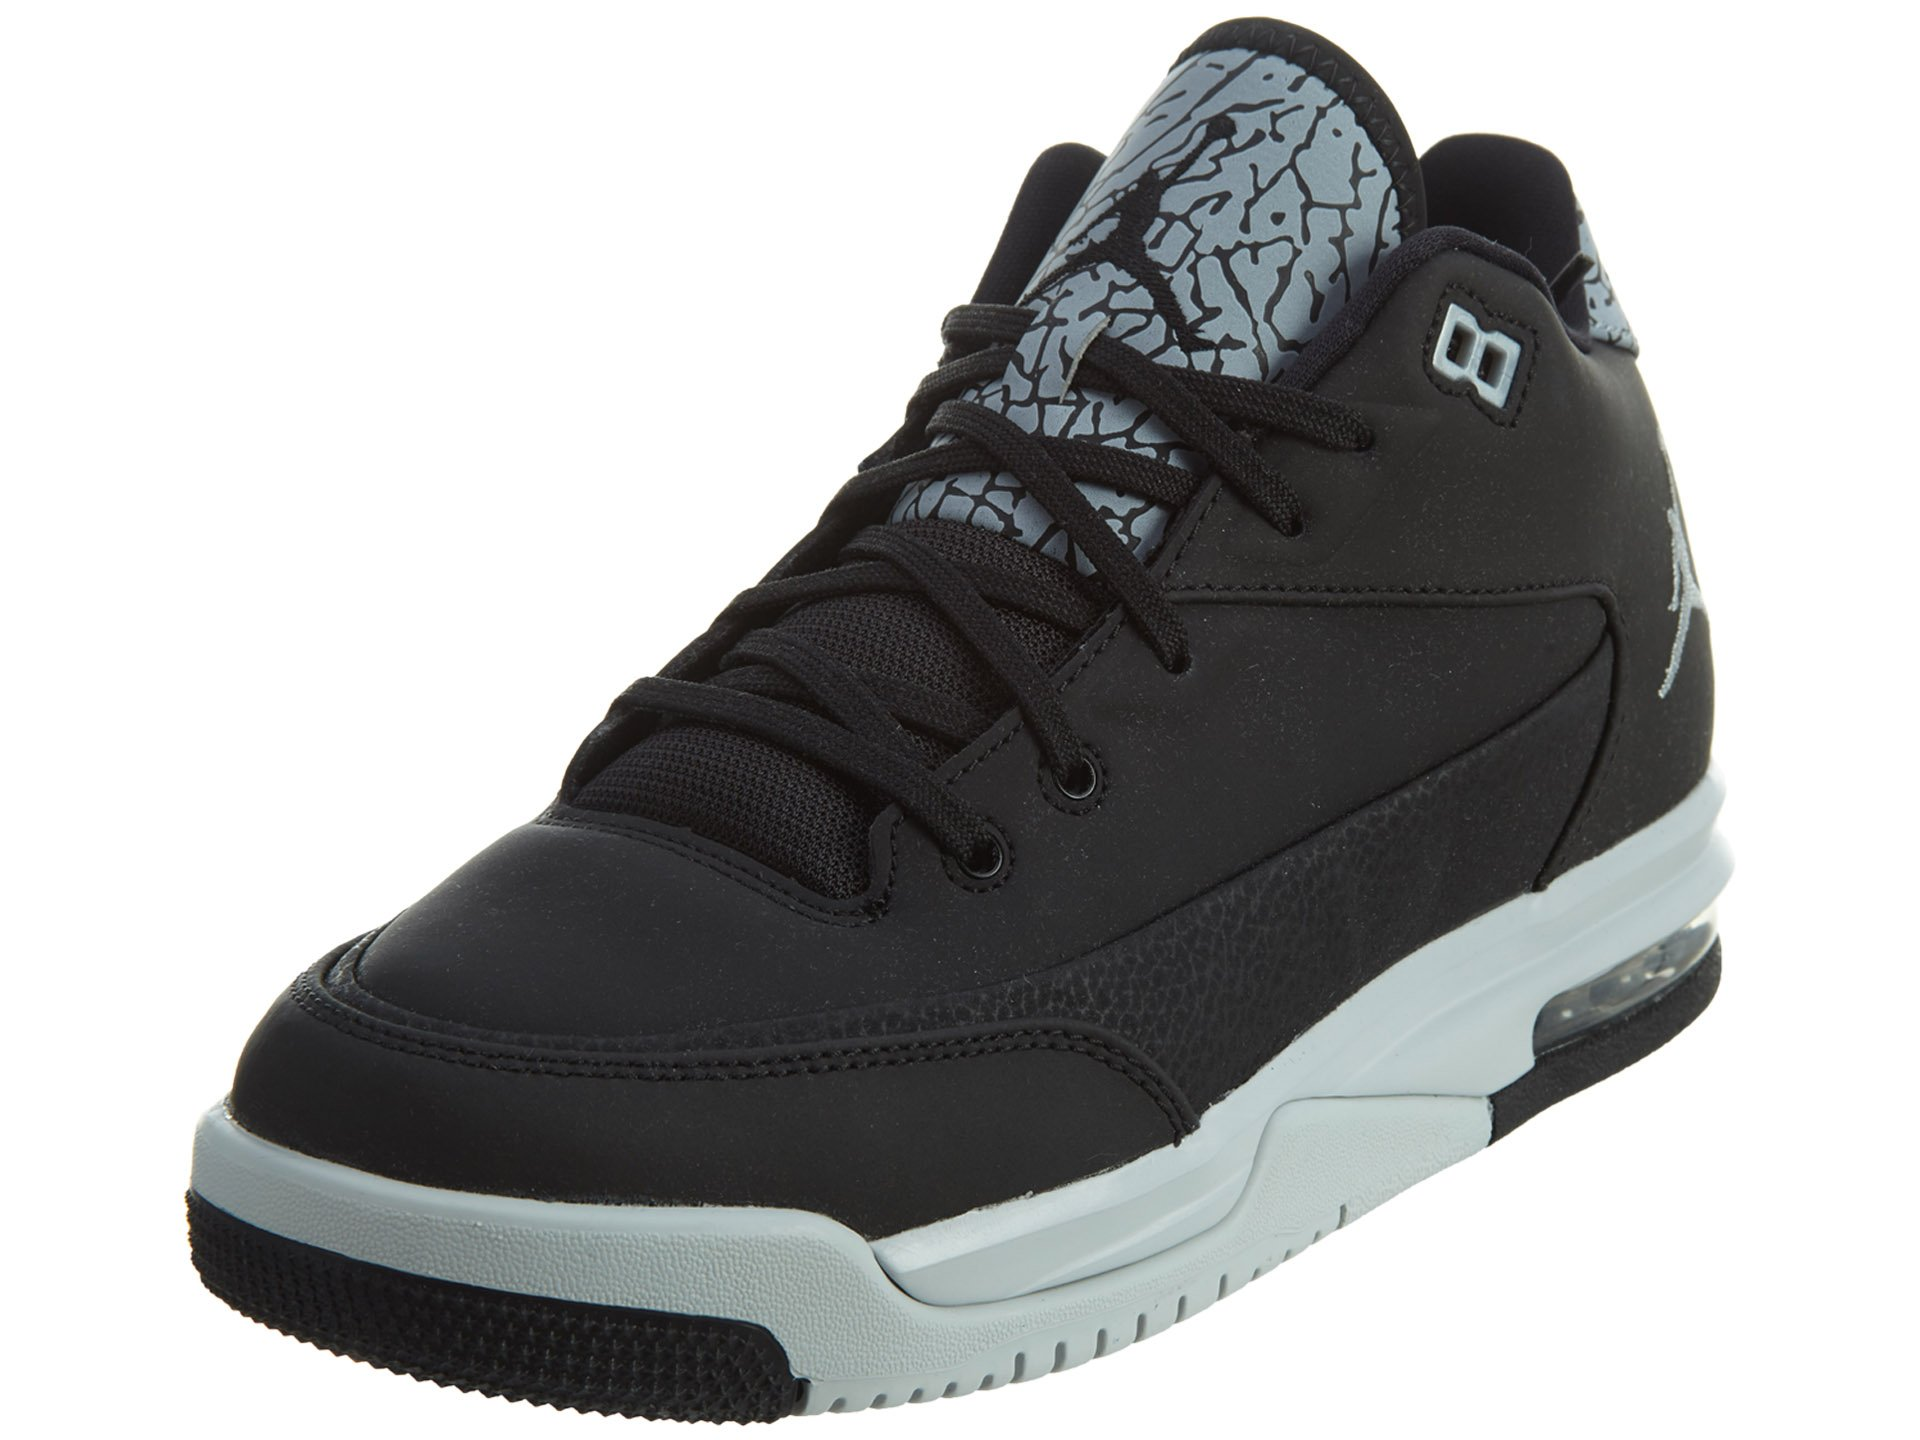 info for 04e4a 8d420 Galleon - Jordan Nike Kids Flight Origin 3 Bg Black Metallic Silver Pr  Pltnm Basketball Shoe 5 Kids US